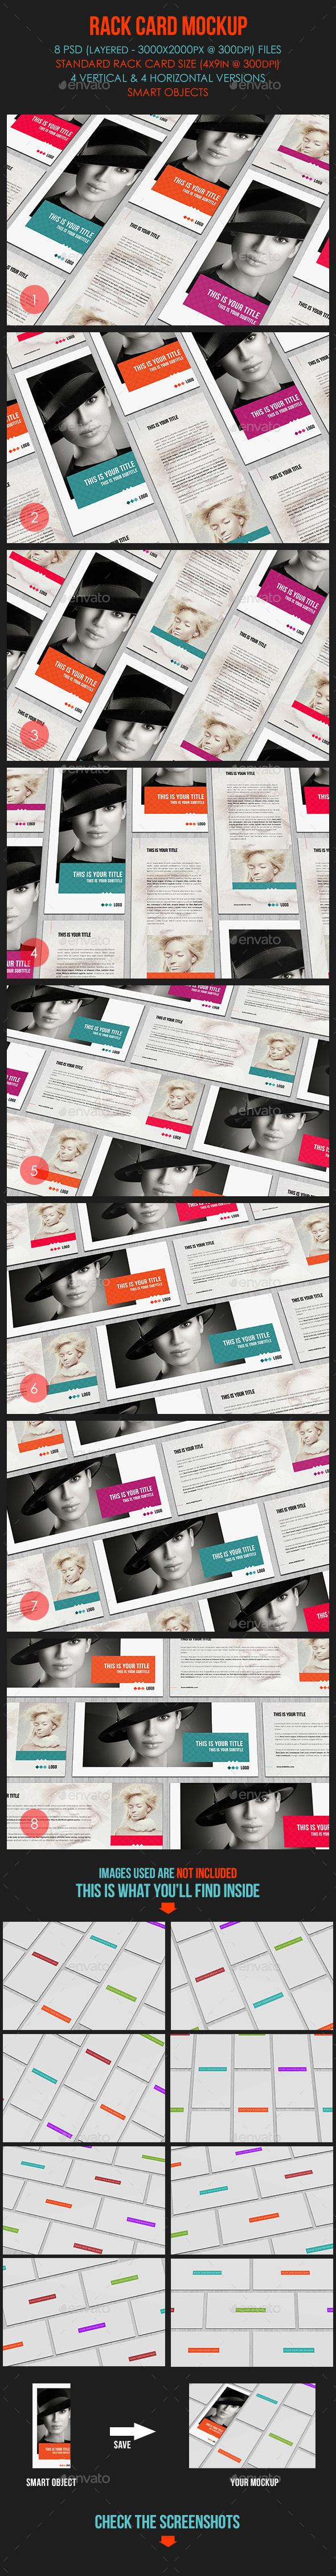 rack card mockup miscellaneous print - Standard Rack Card Size